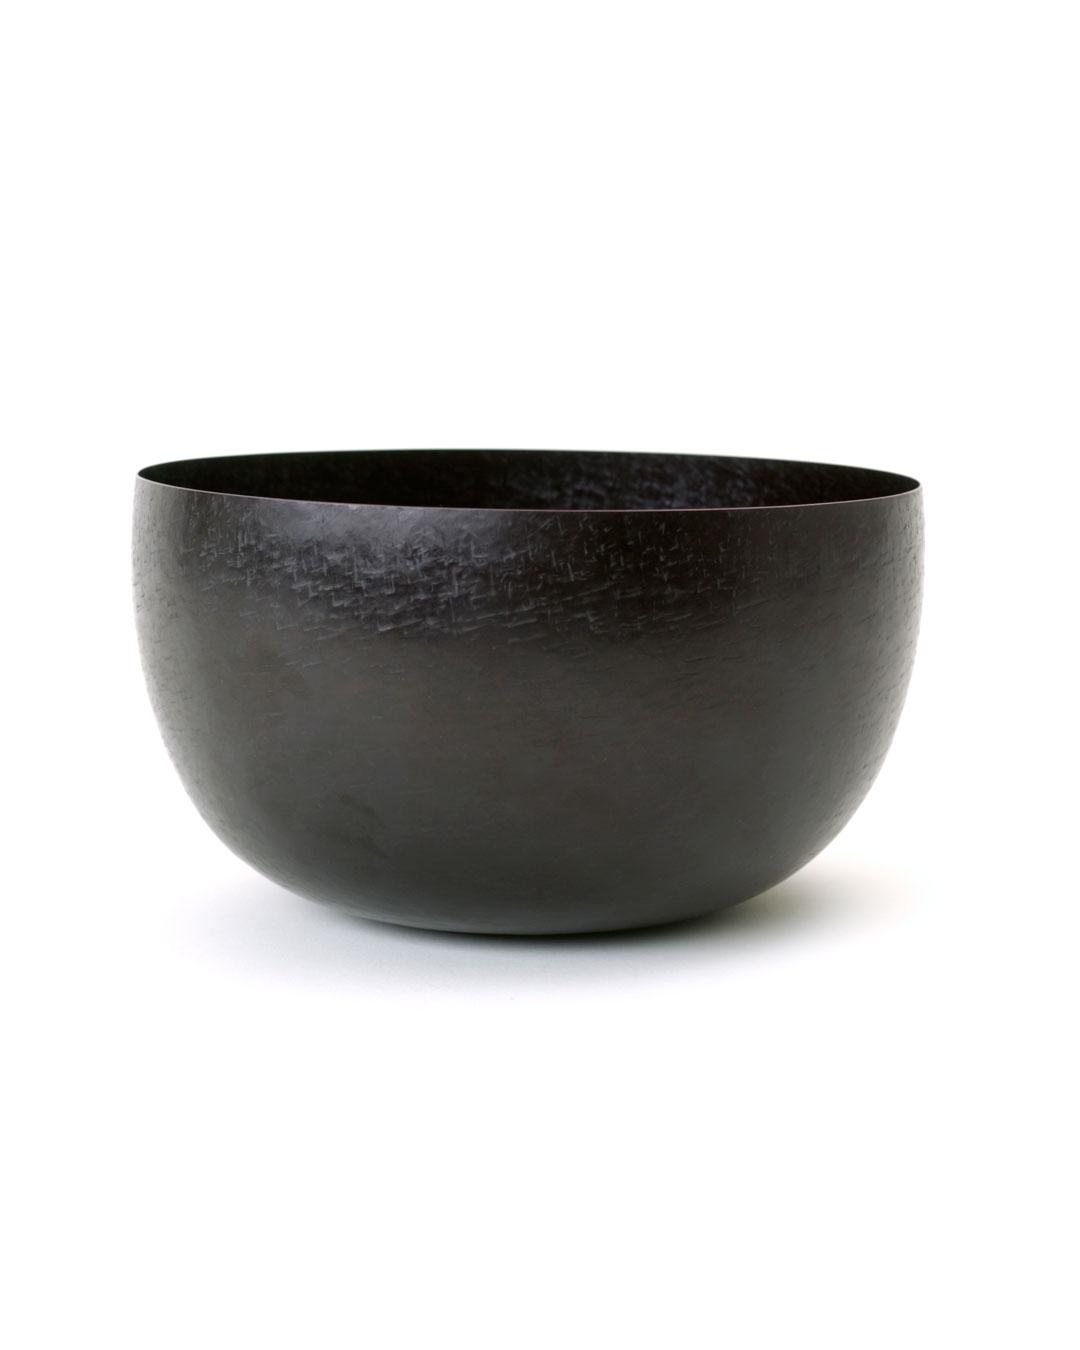 Tore Svensson, untitled, 2000, bowl; iron, partly gilt, 135 x ø 250 mm, €3500